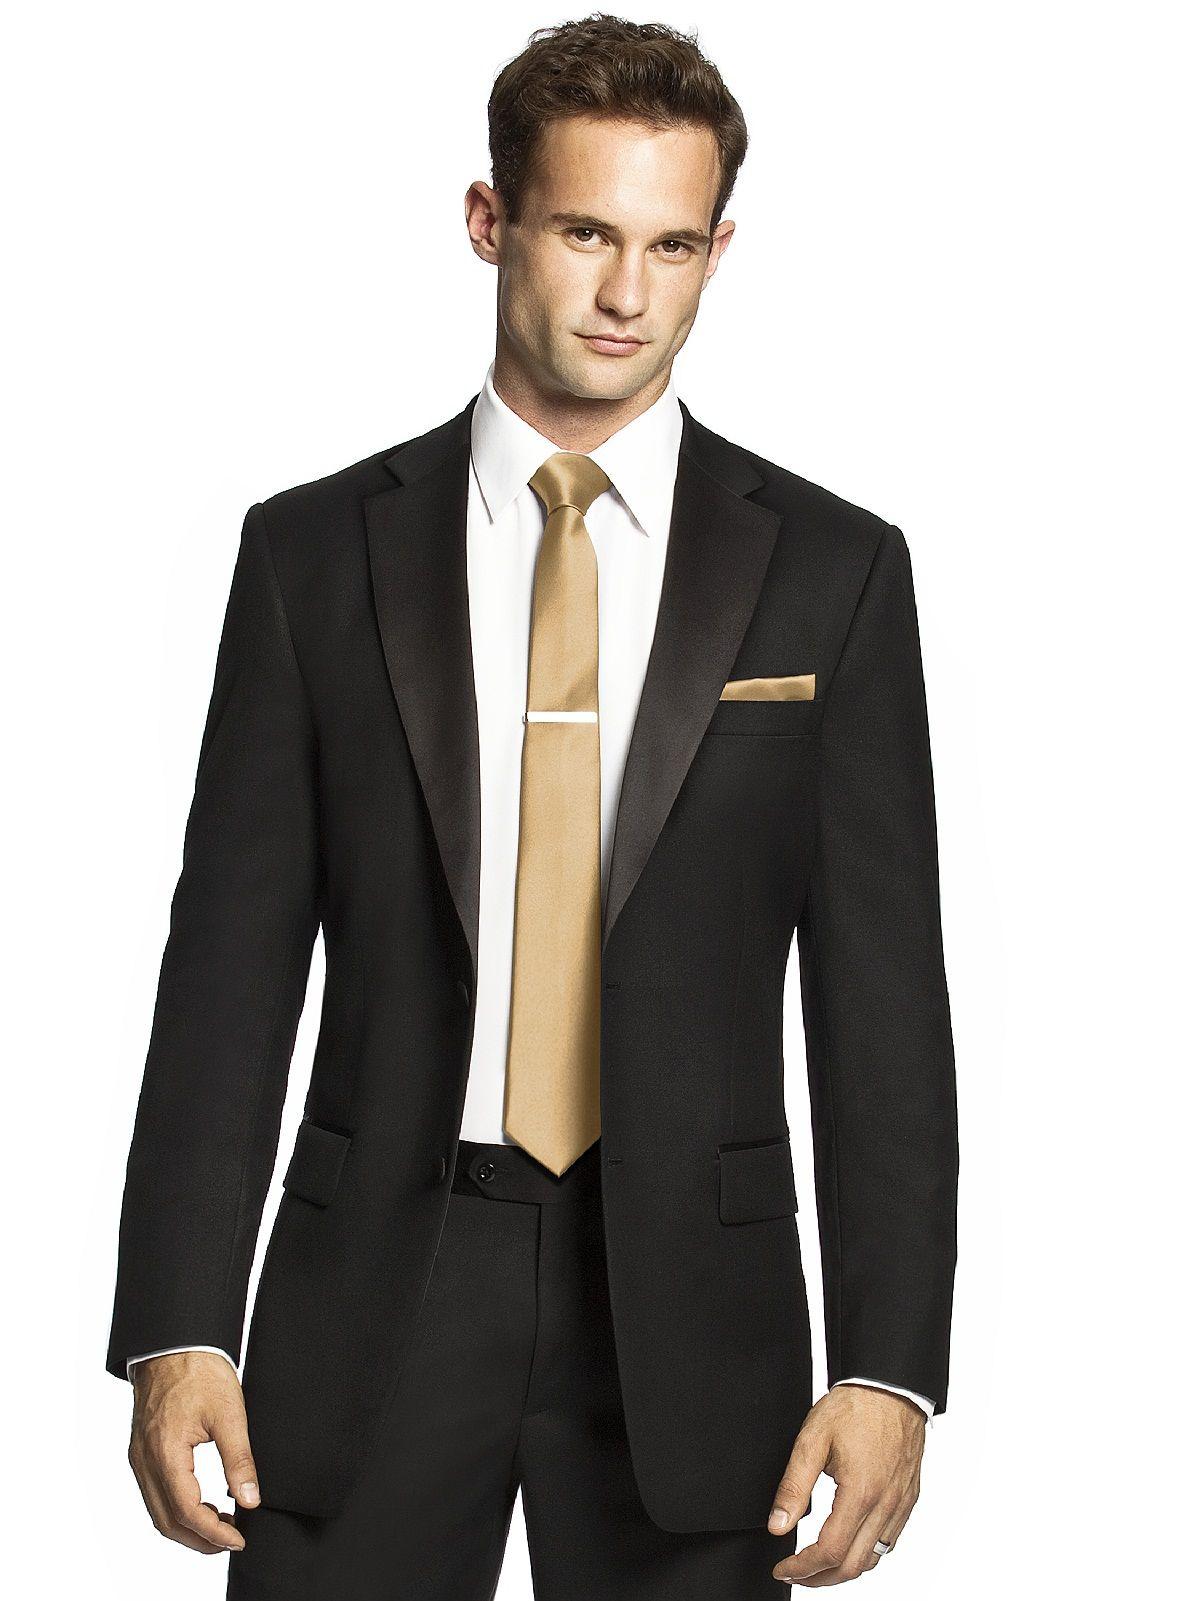 Light gold ties for the groomsmen | Wedding Ideas ...